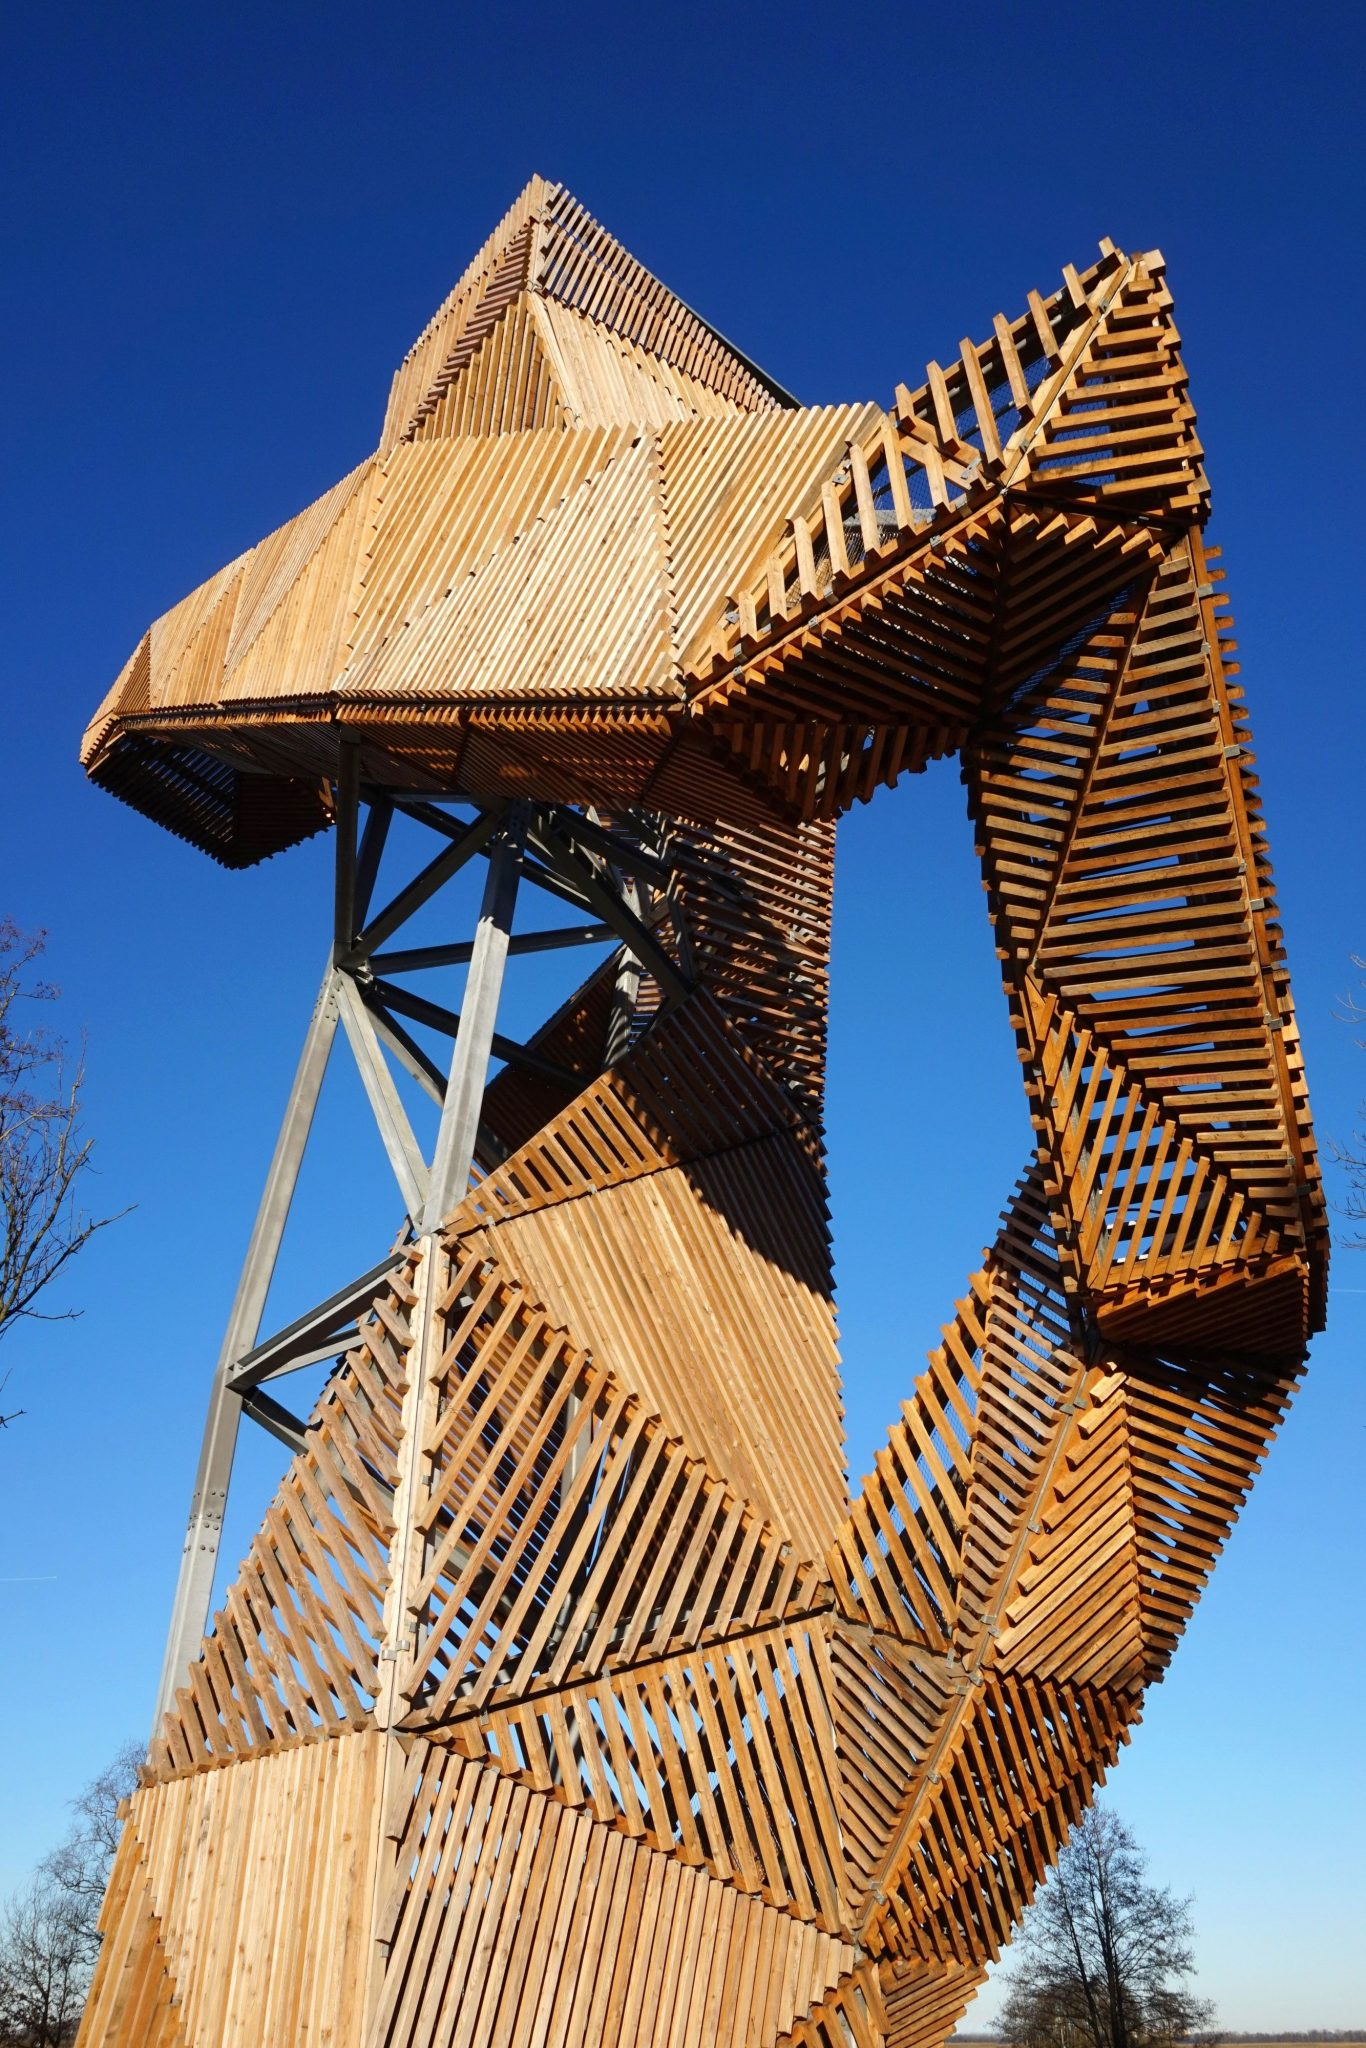 Ateliereen-uitkijktoren-onlanden-06